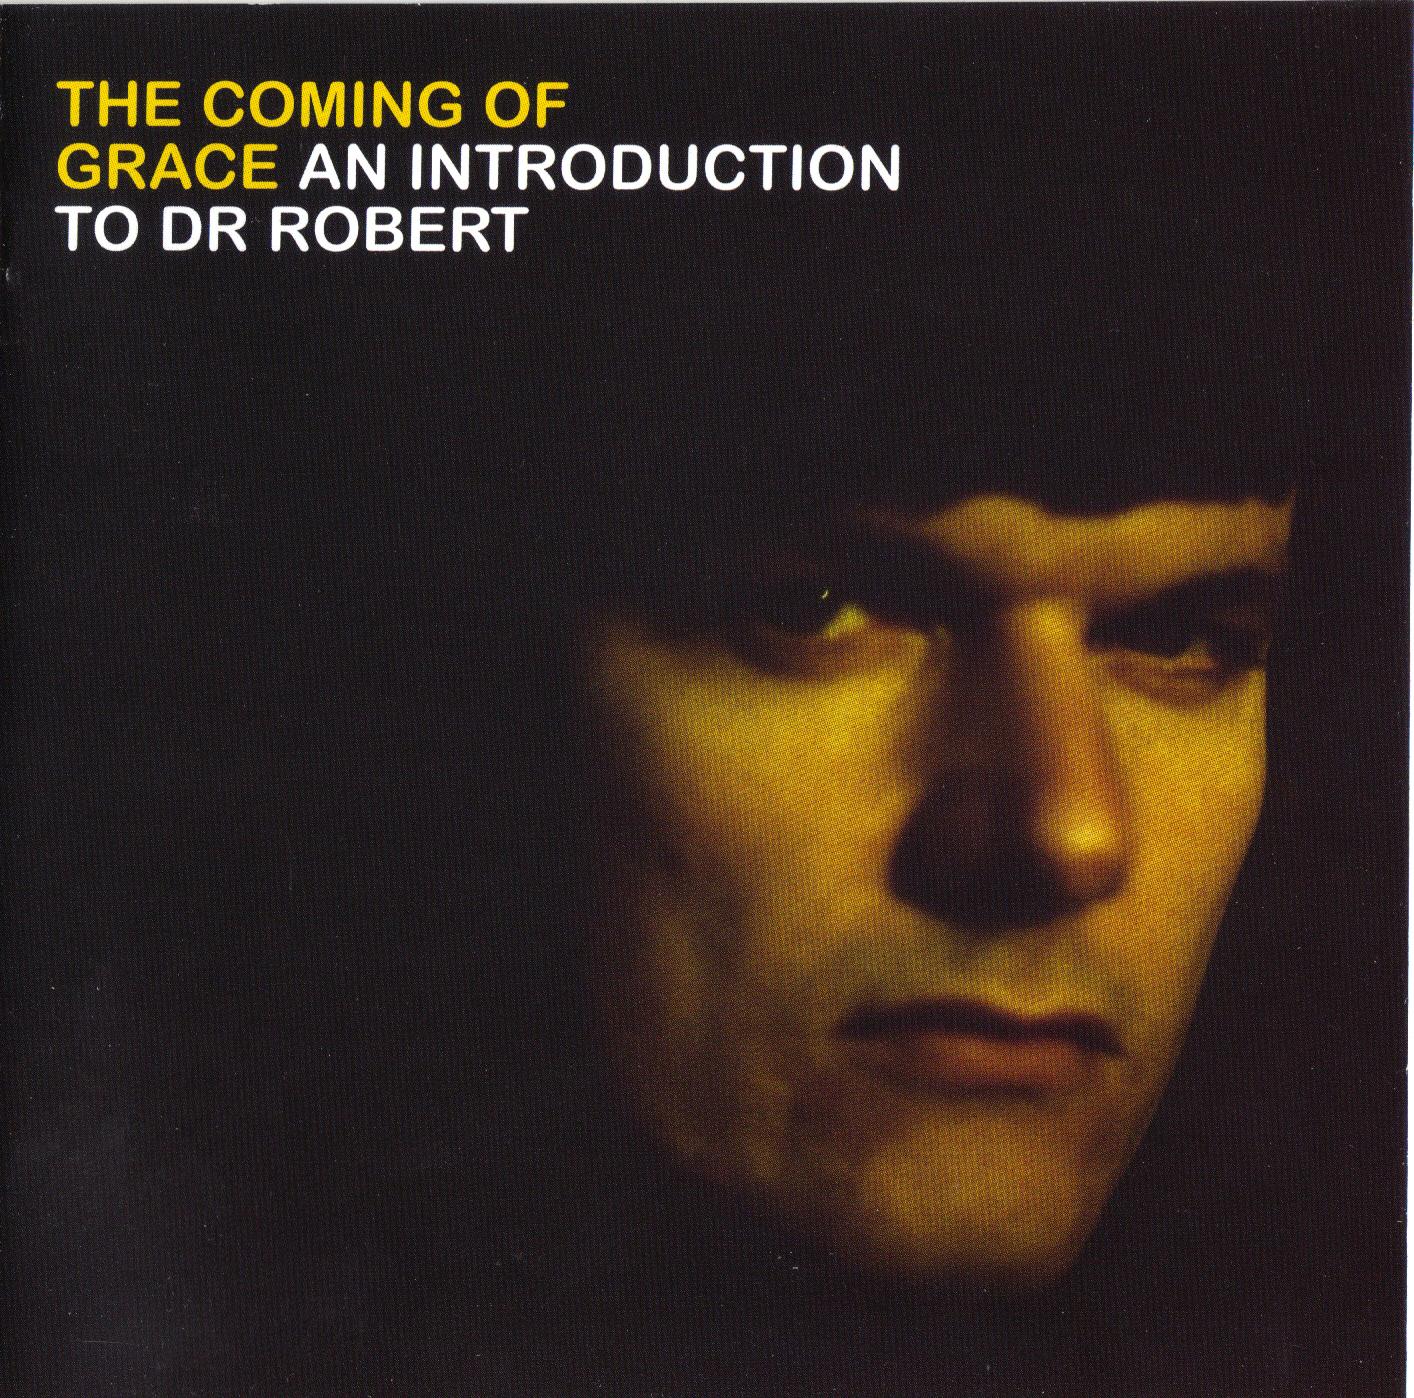 Dr Robert Compilation.jpg